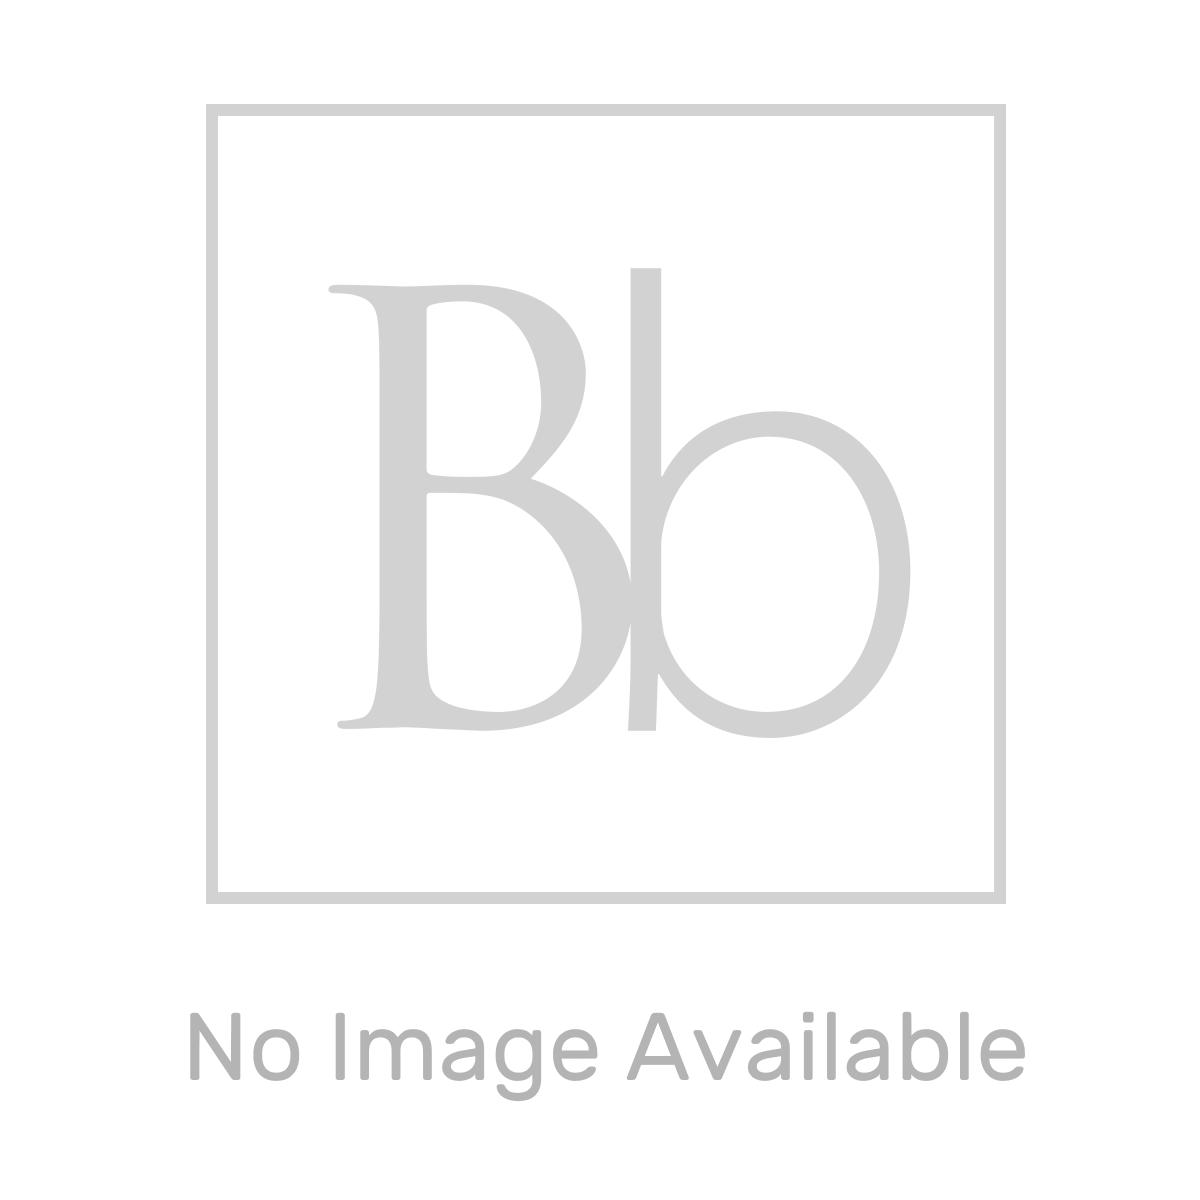 RAK Feeling Greige Square Single Outlet Thermostatic Shower Valve Measurements